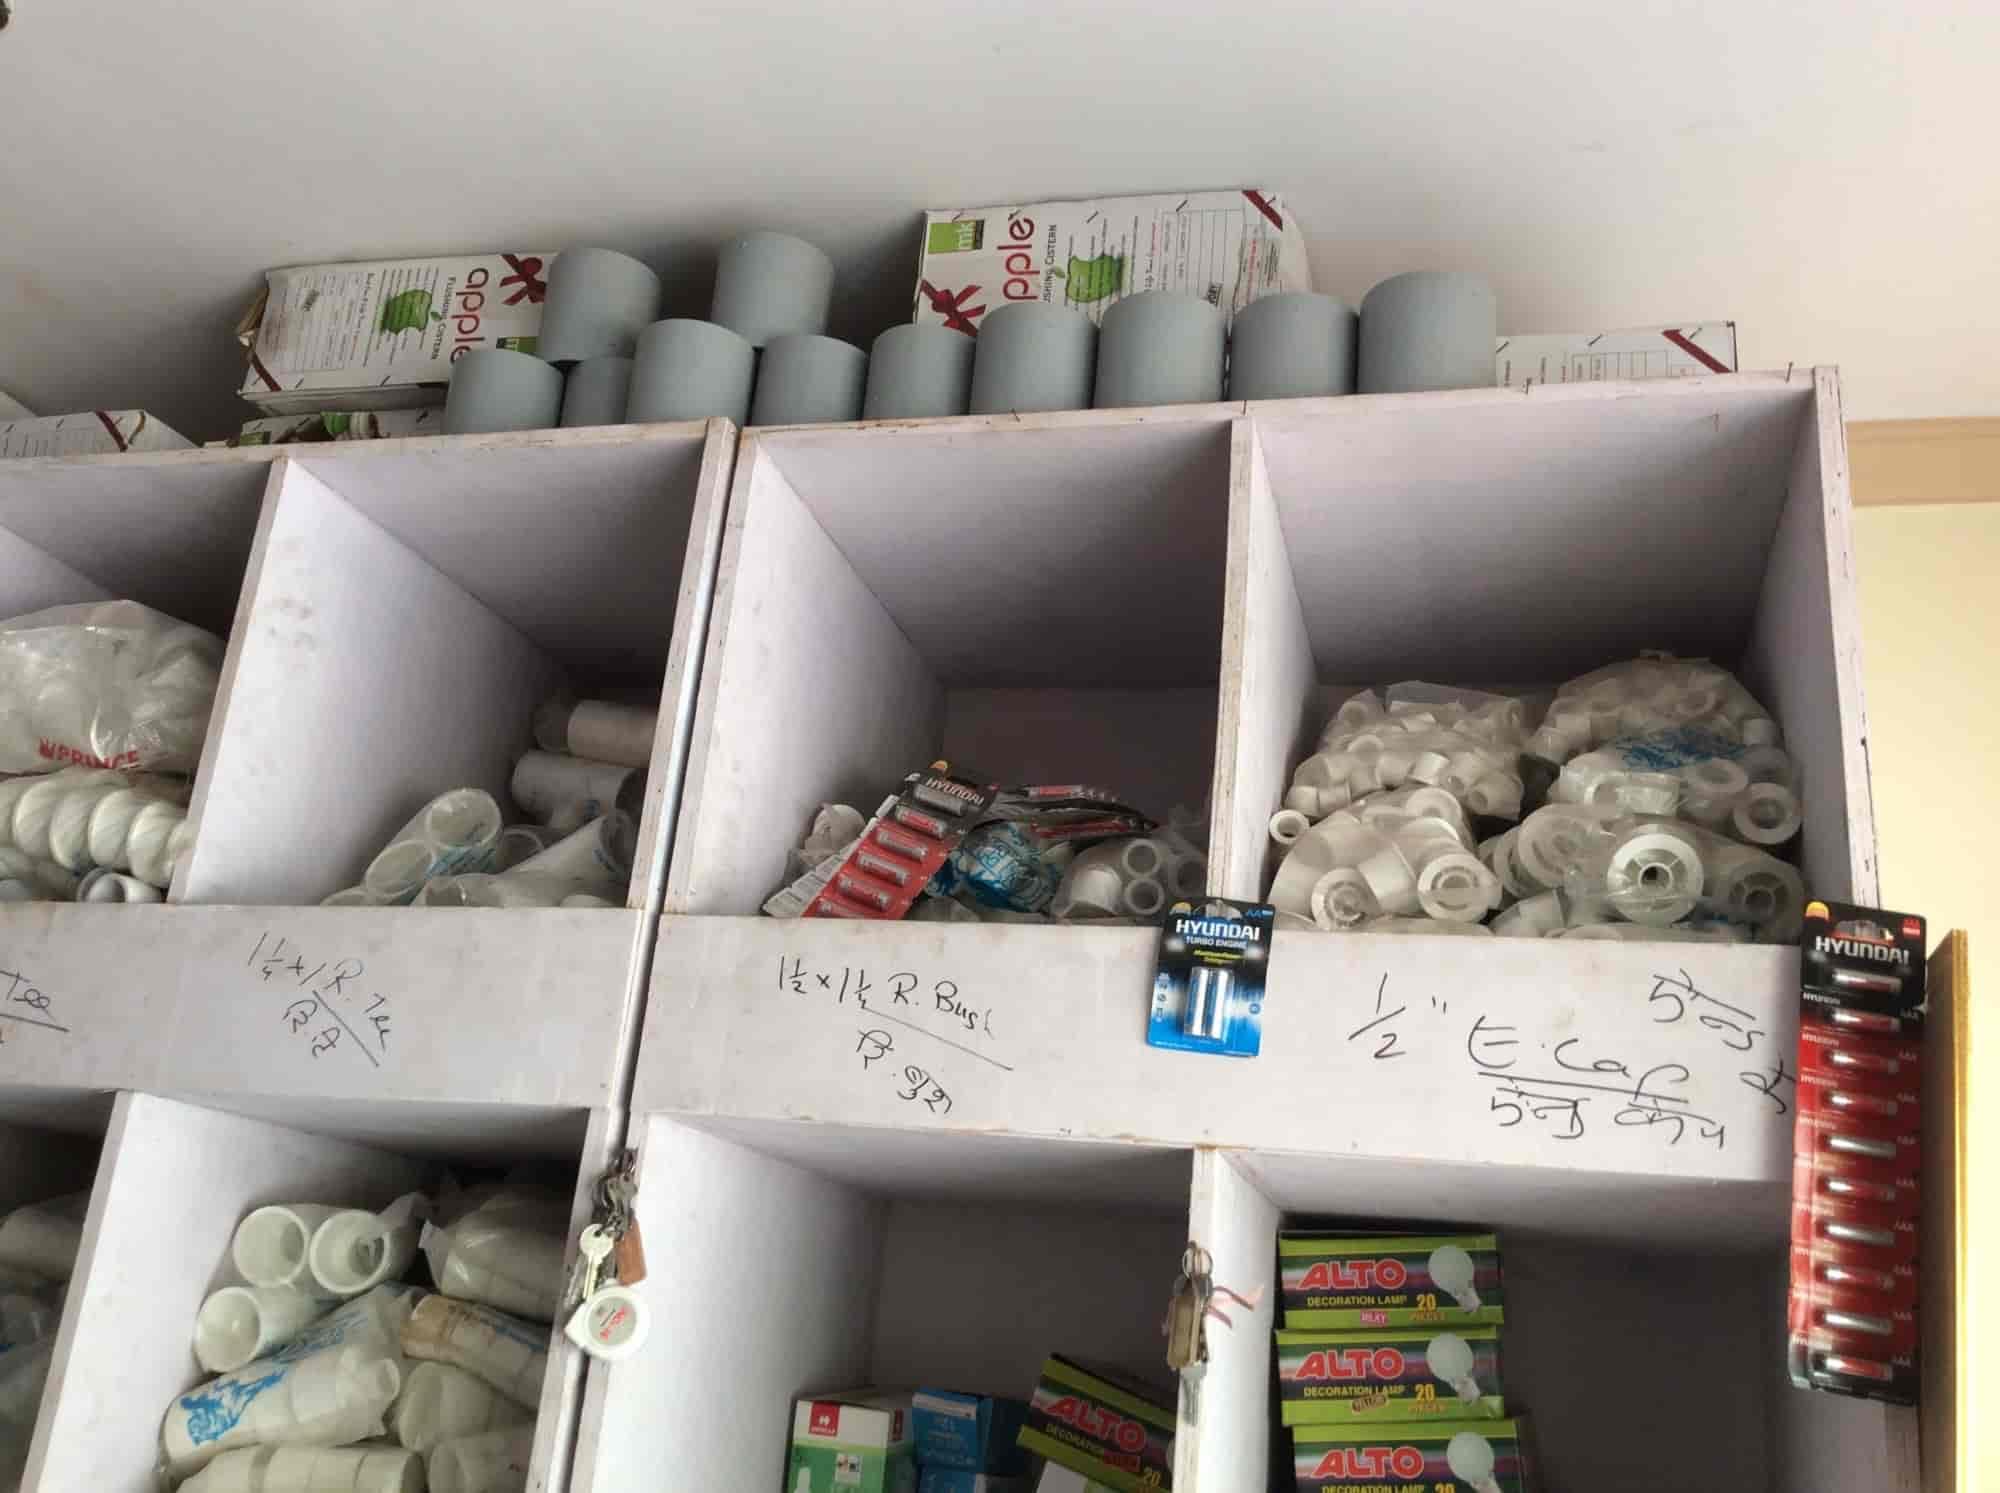 Vinayak Pipes Suppliers Photos, Virar West, Mumbai- Pictures